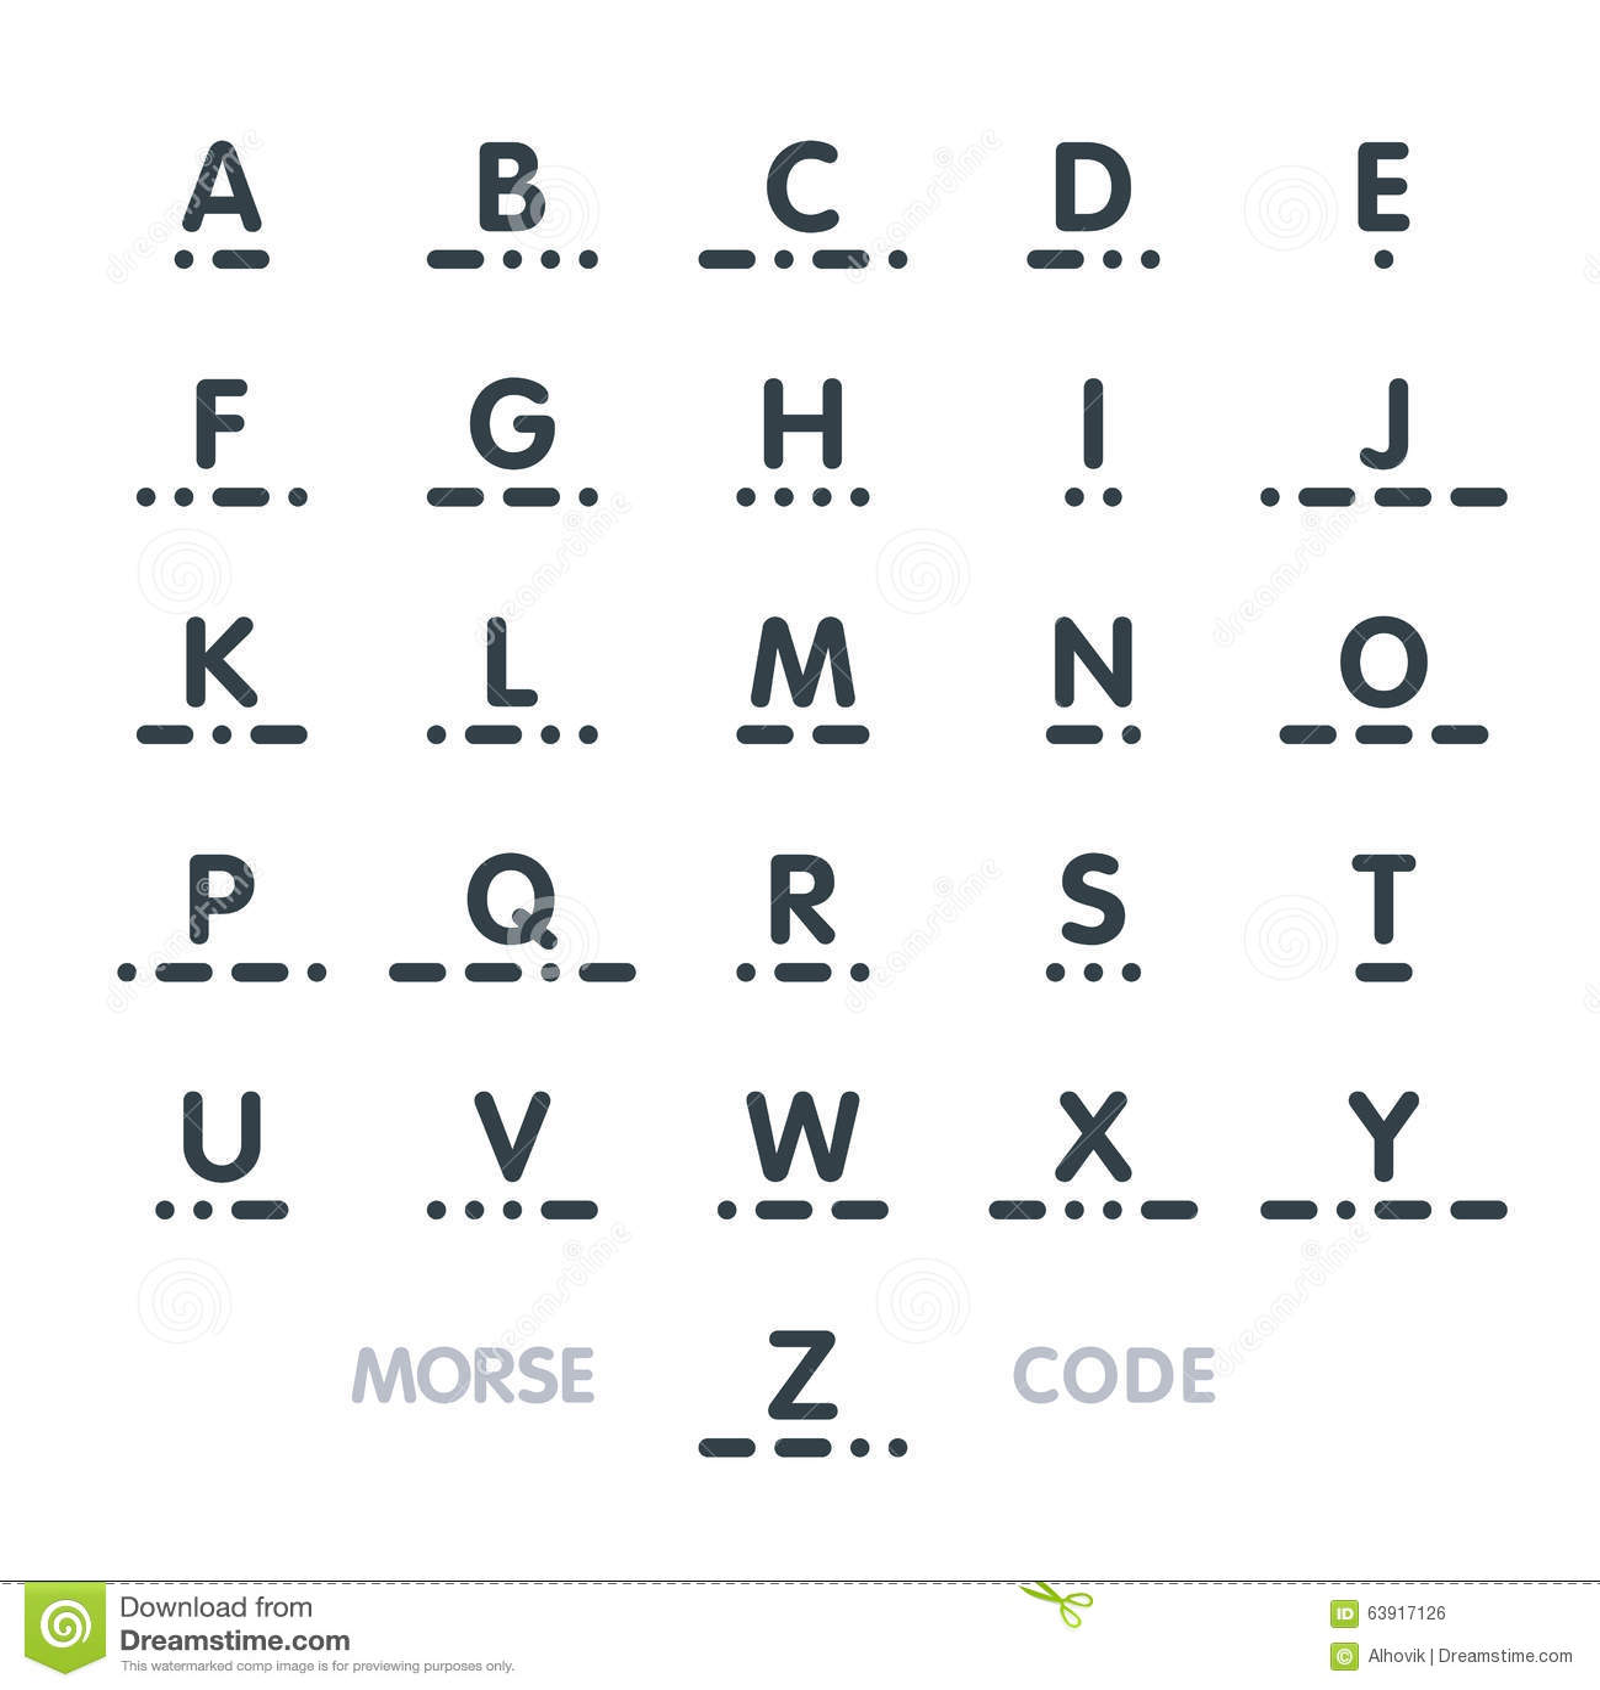 Morse Code Alphabet Stock Vector Illustration Of Mark